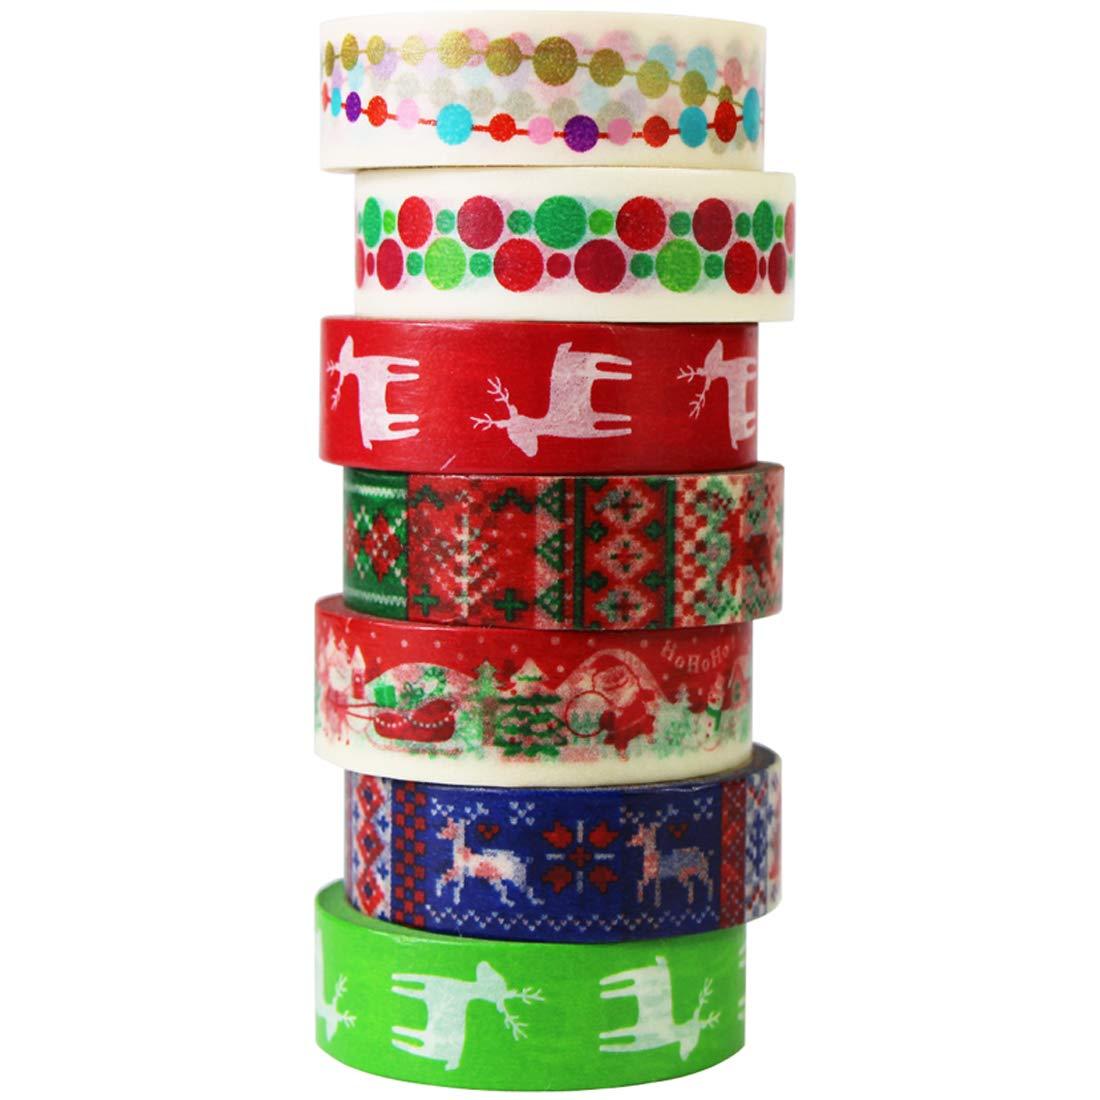 6 Rotoli Washi Tape Natale Christmas Decorativo Nastri Adesivi UOOOM